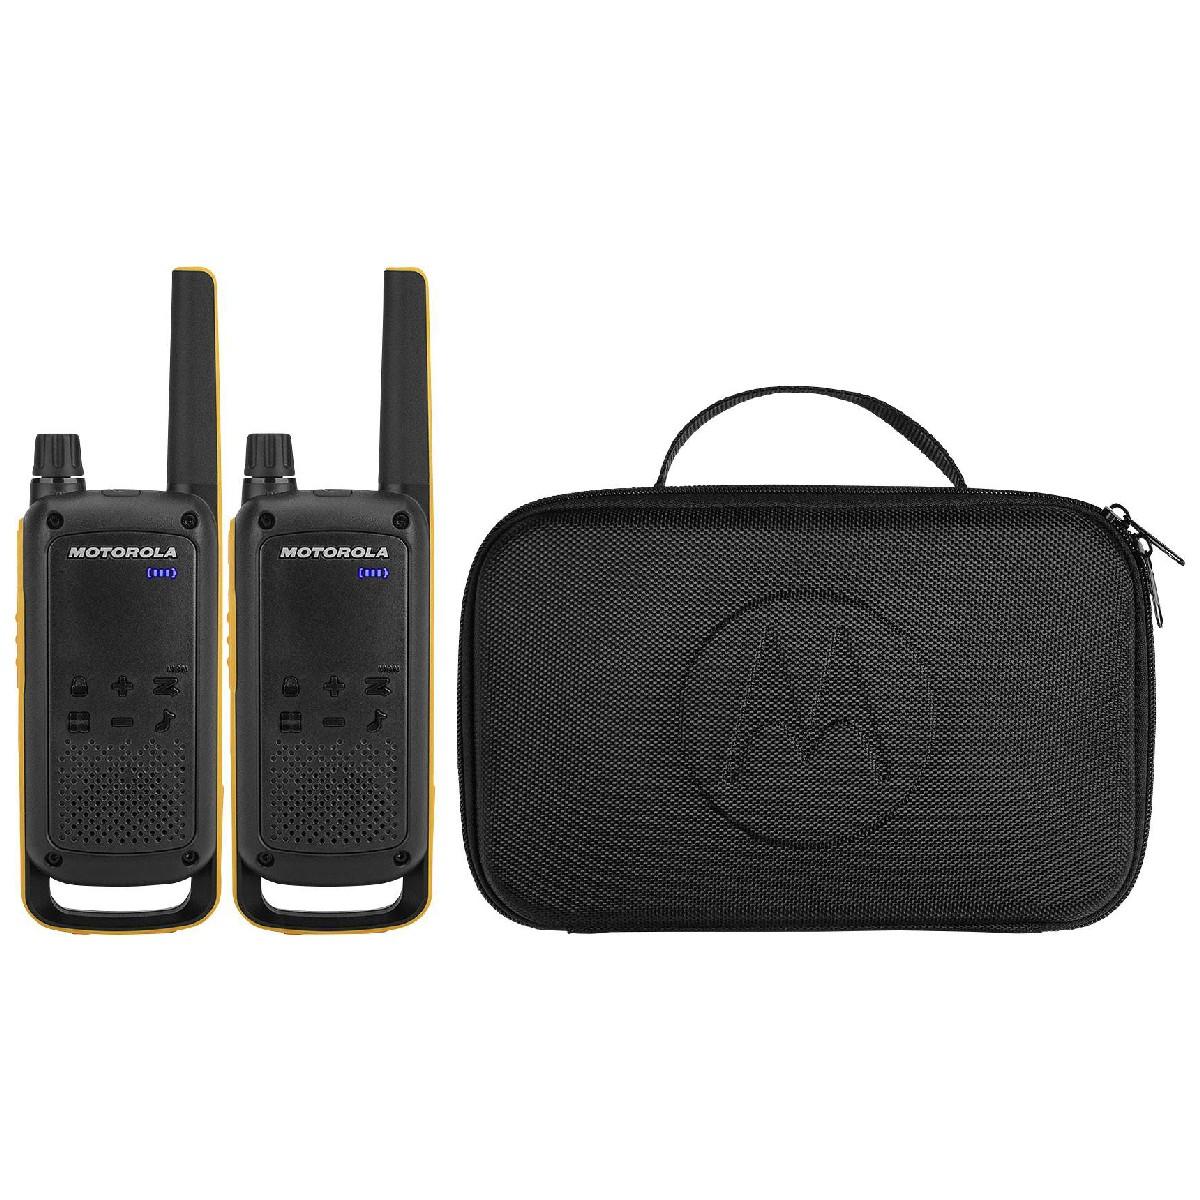 Walkie Talkie Motorola Go Beyond PMR T82 Extreme IPX4 Μαύρο με Φακό Led και Υποδοχή Hands Free.  Εύρος Κάλυψης 10 km